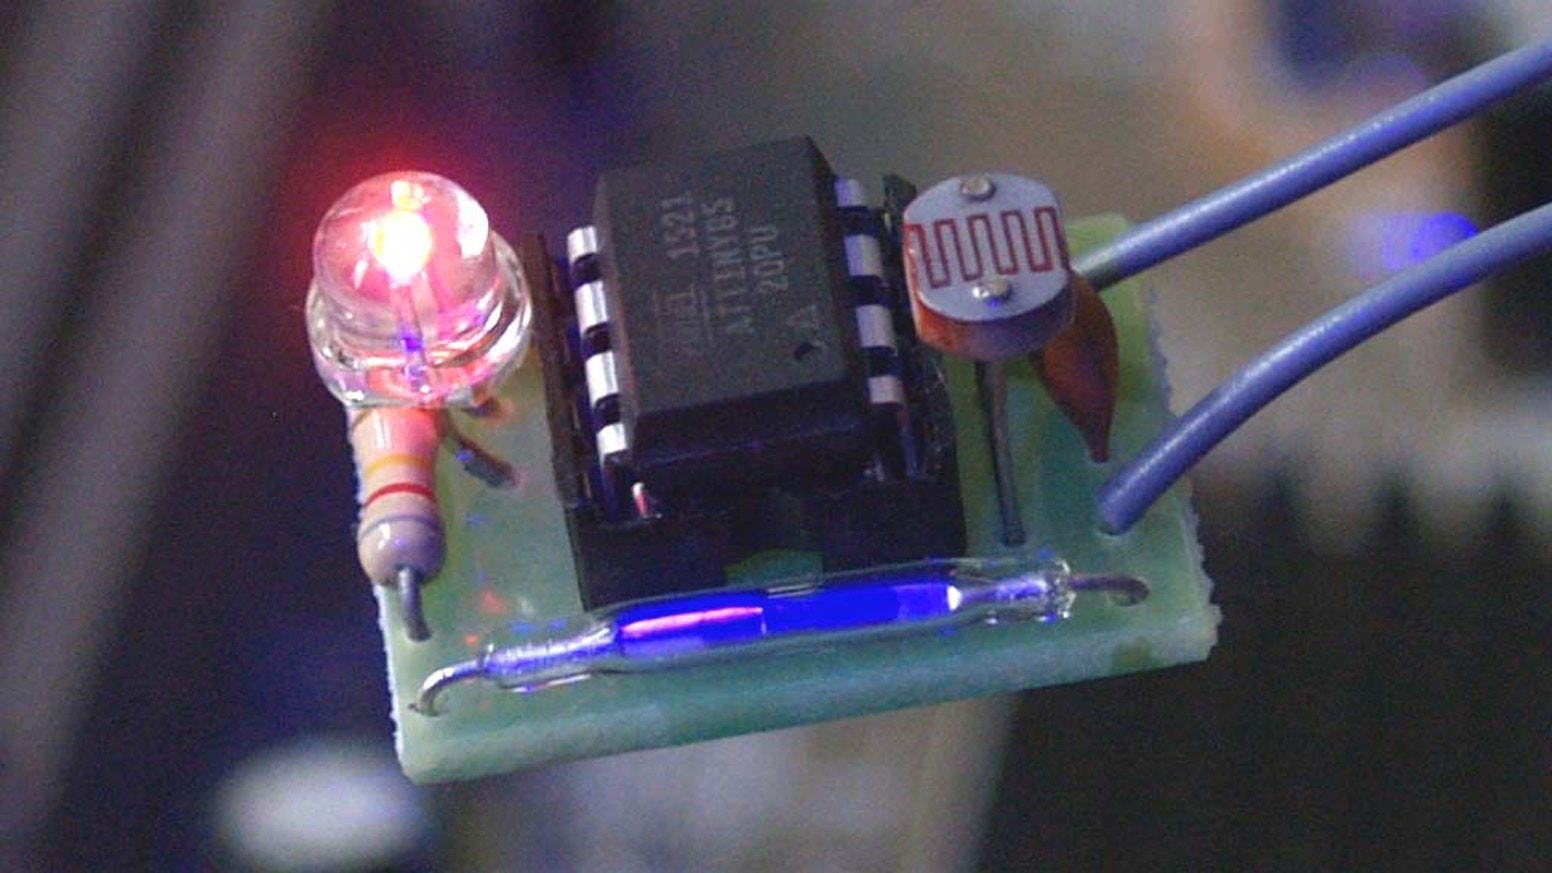 Led night light kickstarter - Geocaching Reactive Light Kit For Night Caching